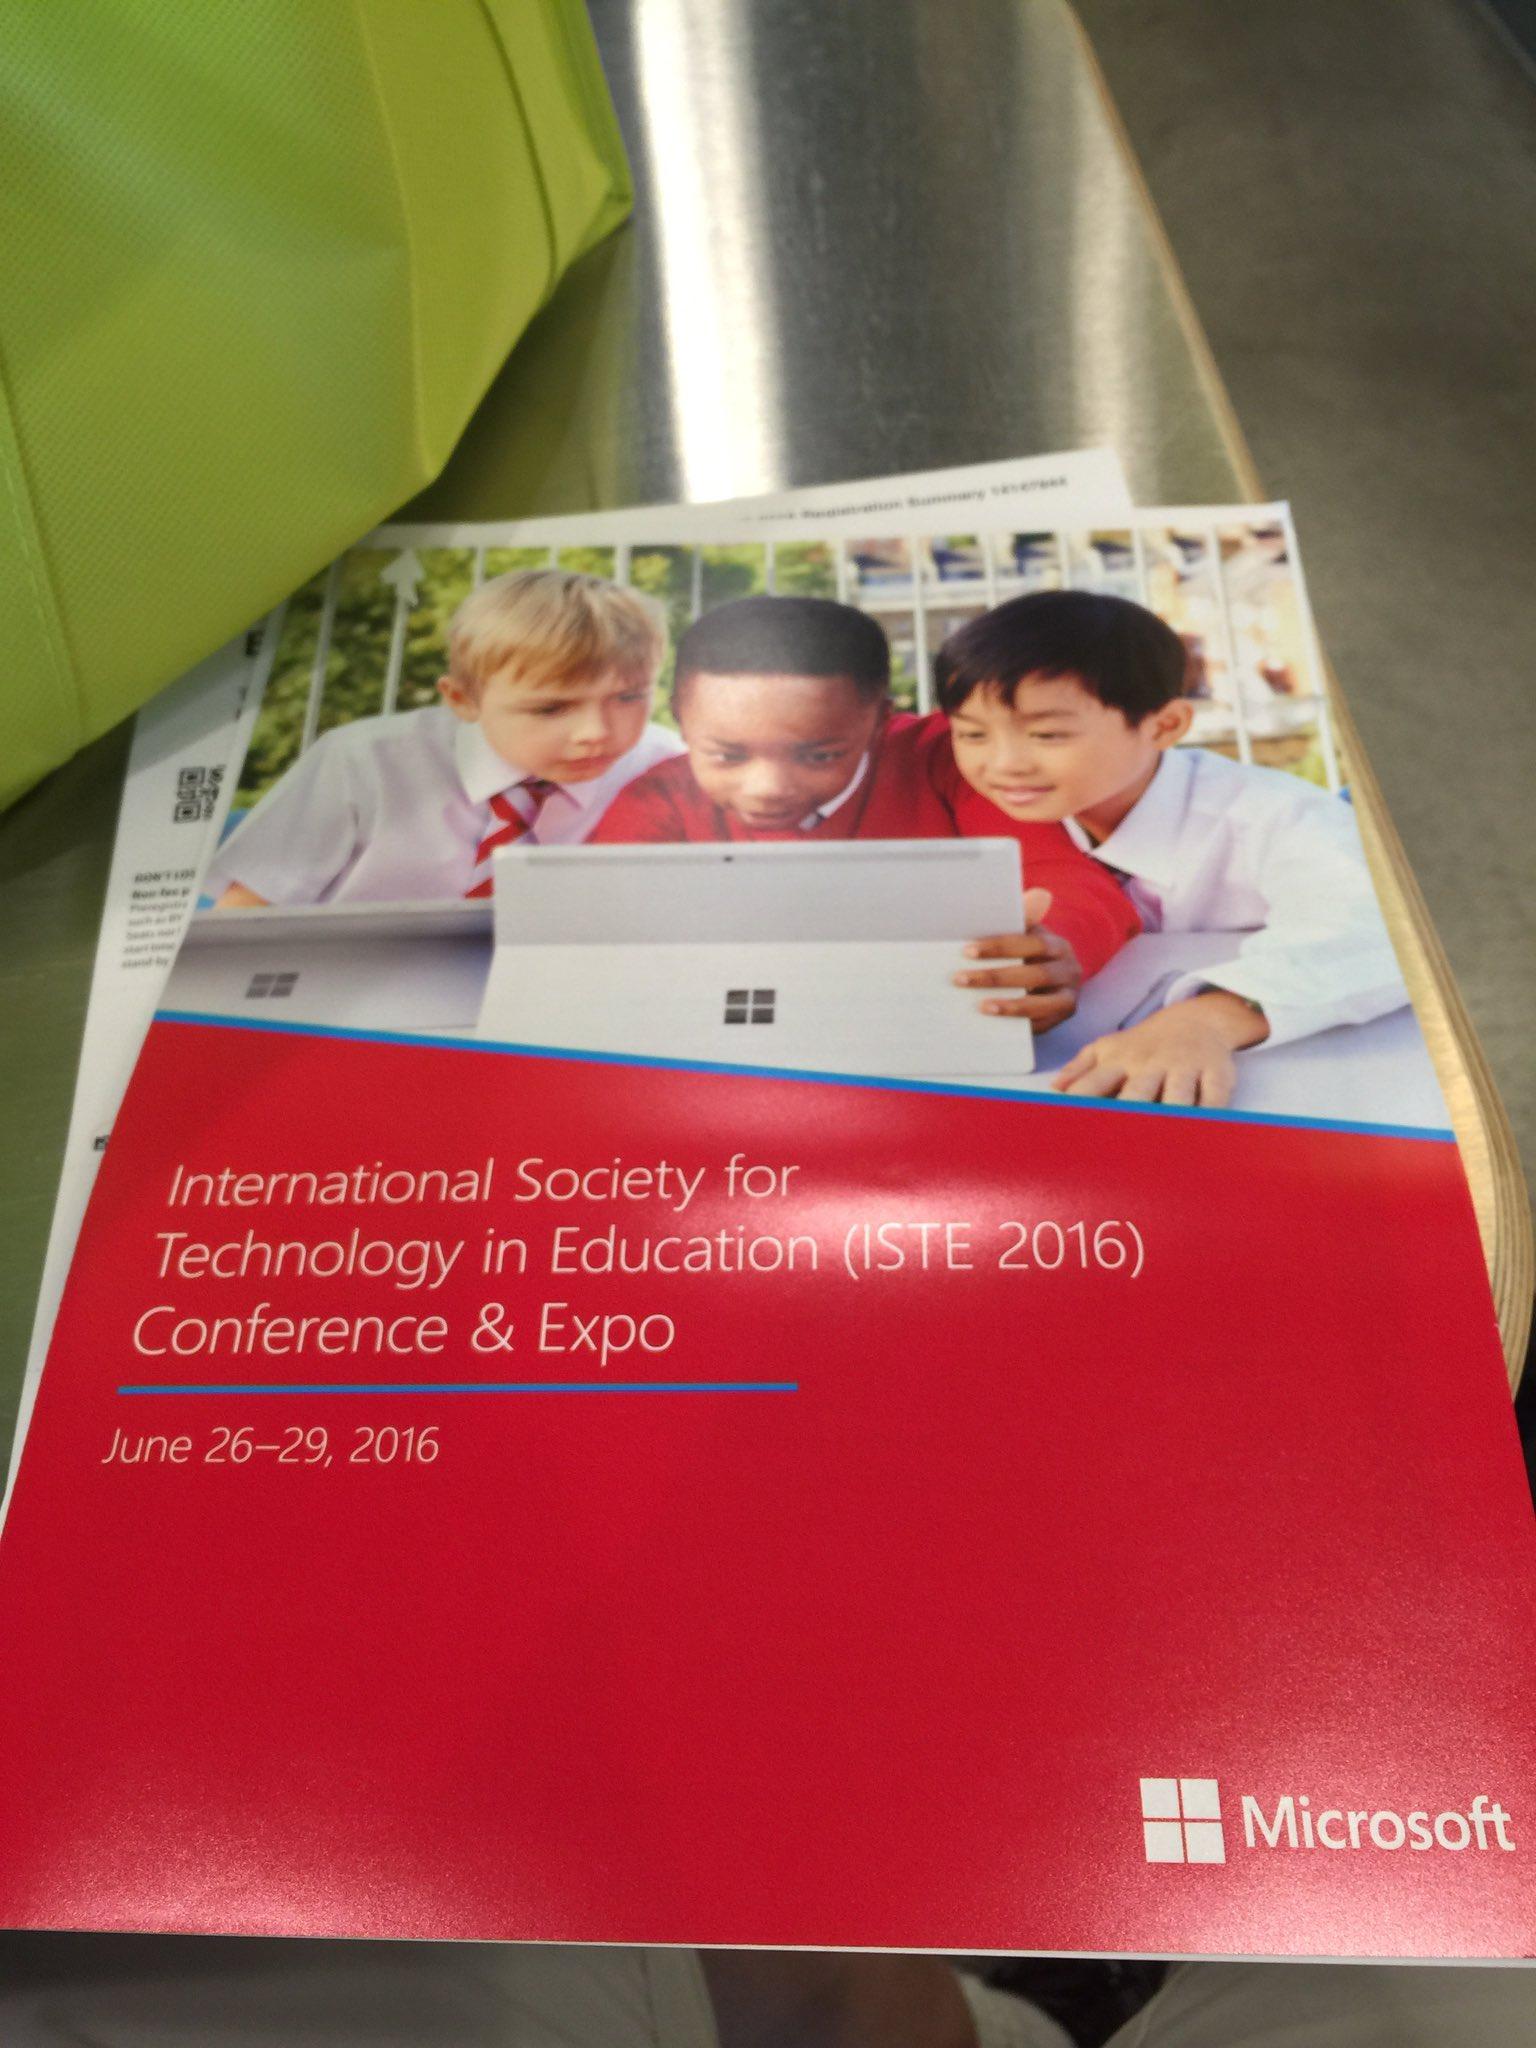 Excited to begin! @Microsoft_EDU #FCPSISTE #ISTE2016 https://t.co/Yi8tgnT0aE